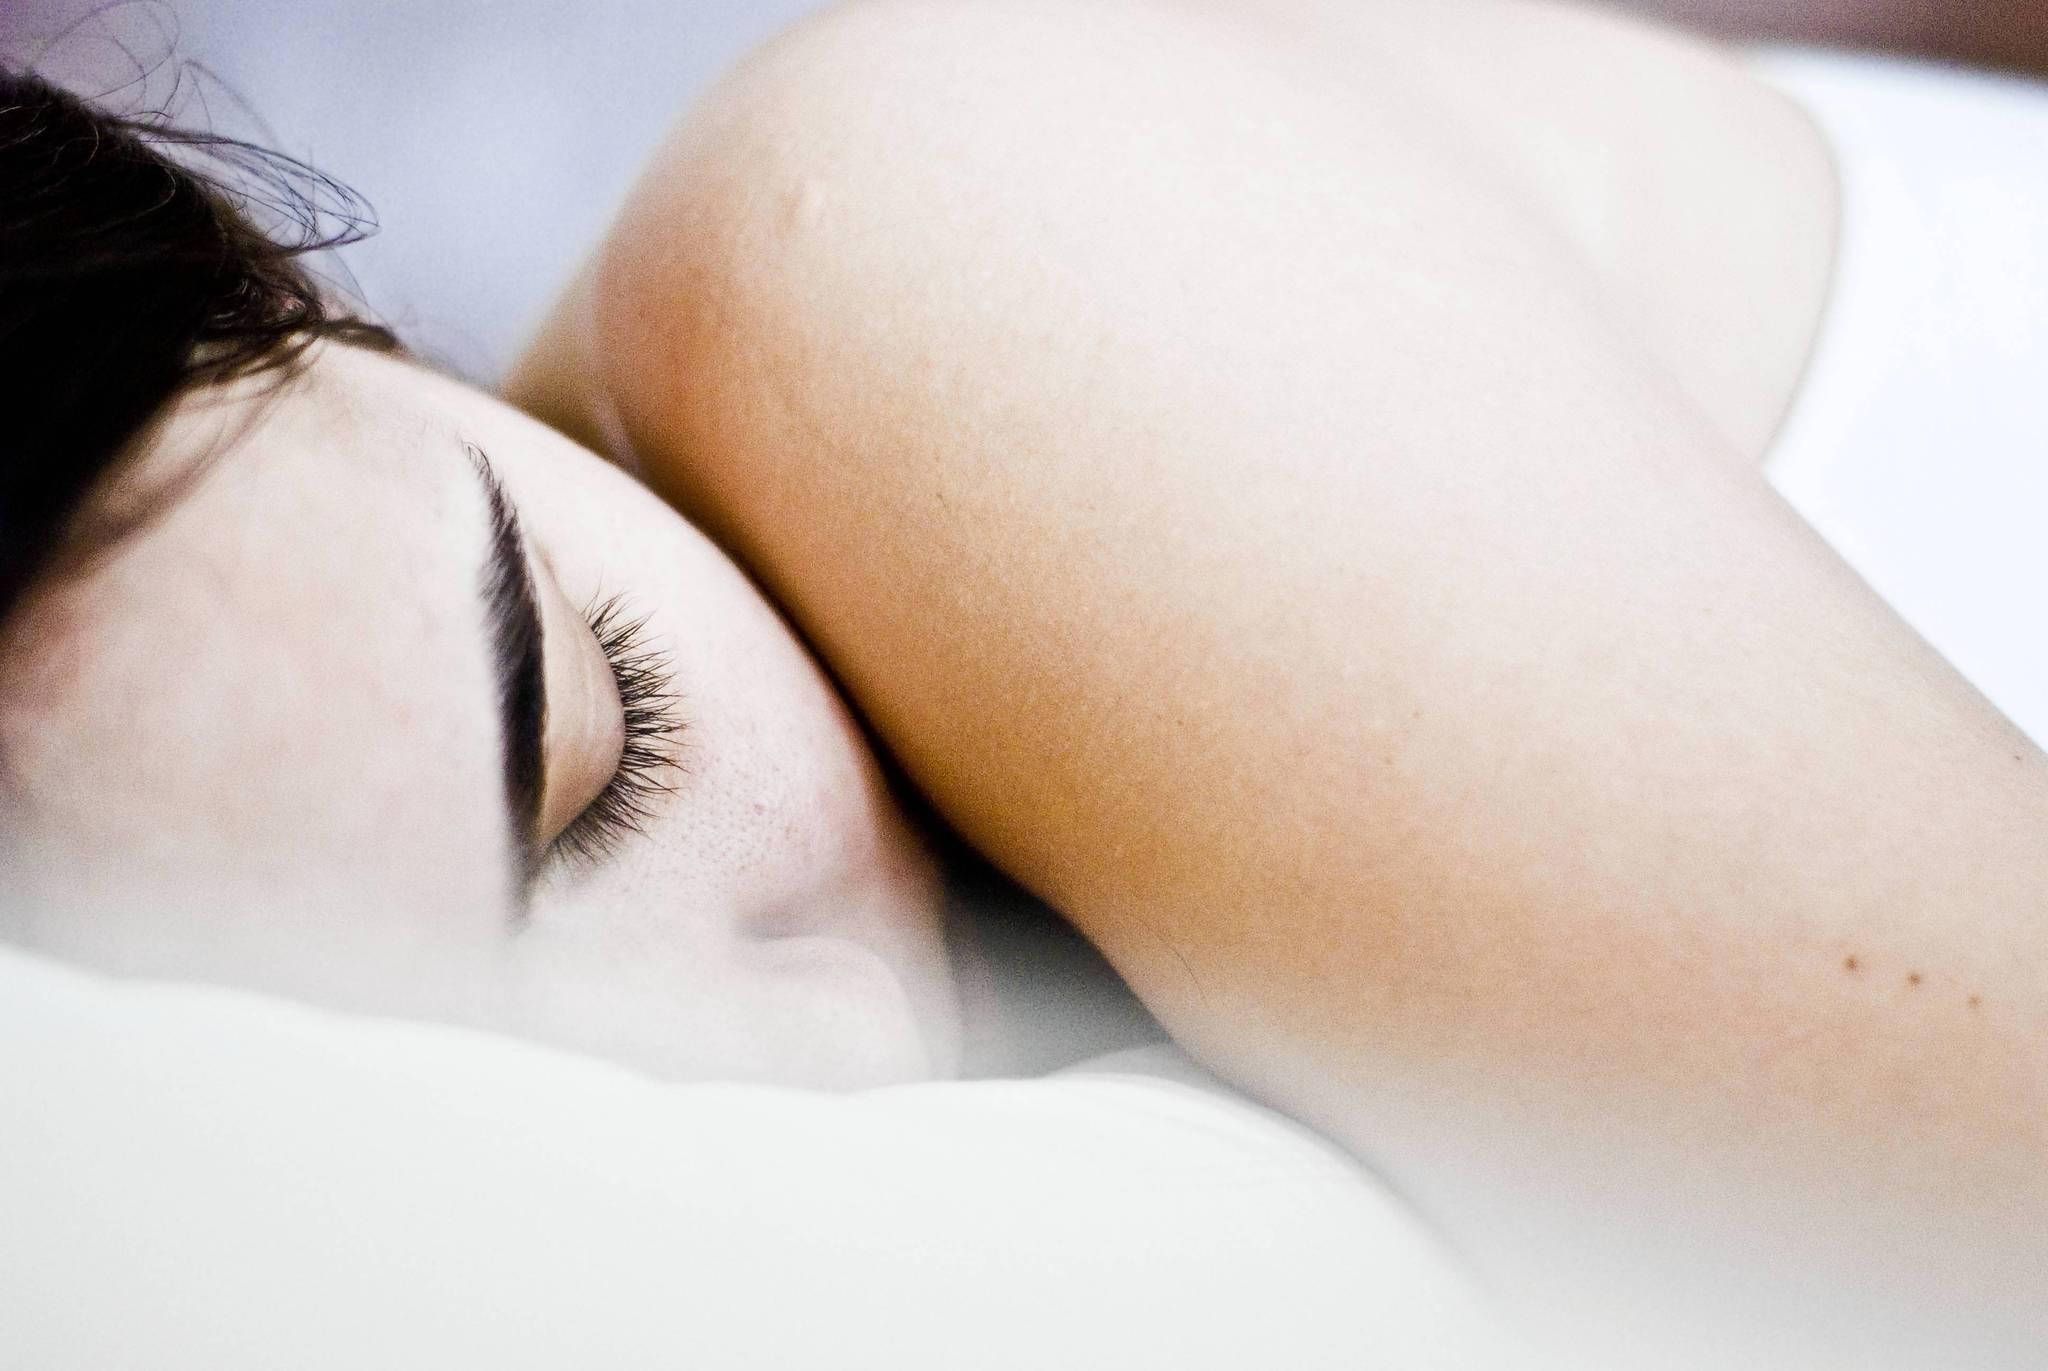 Sleep helps brain retain new information